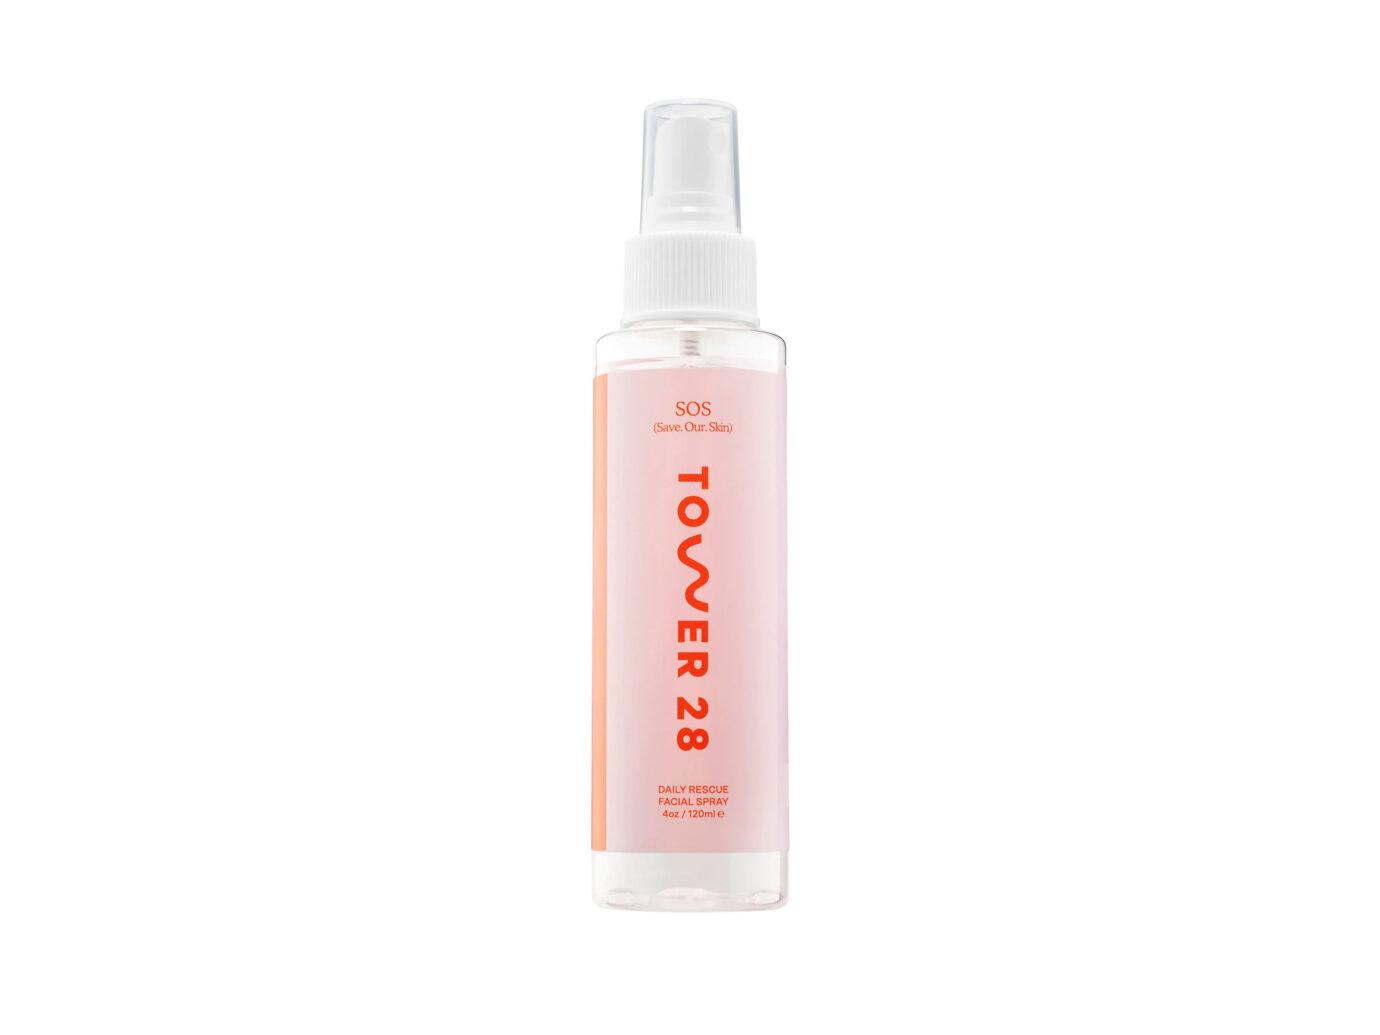 Tower 28 SOS Save.Our.Skin Daily Rescue Facial Spray